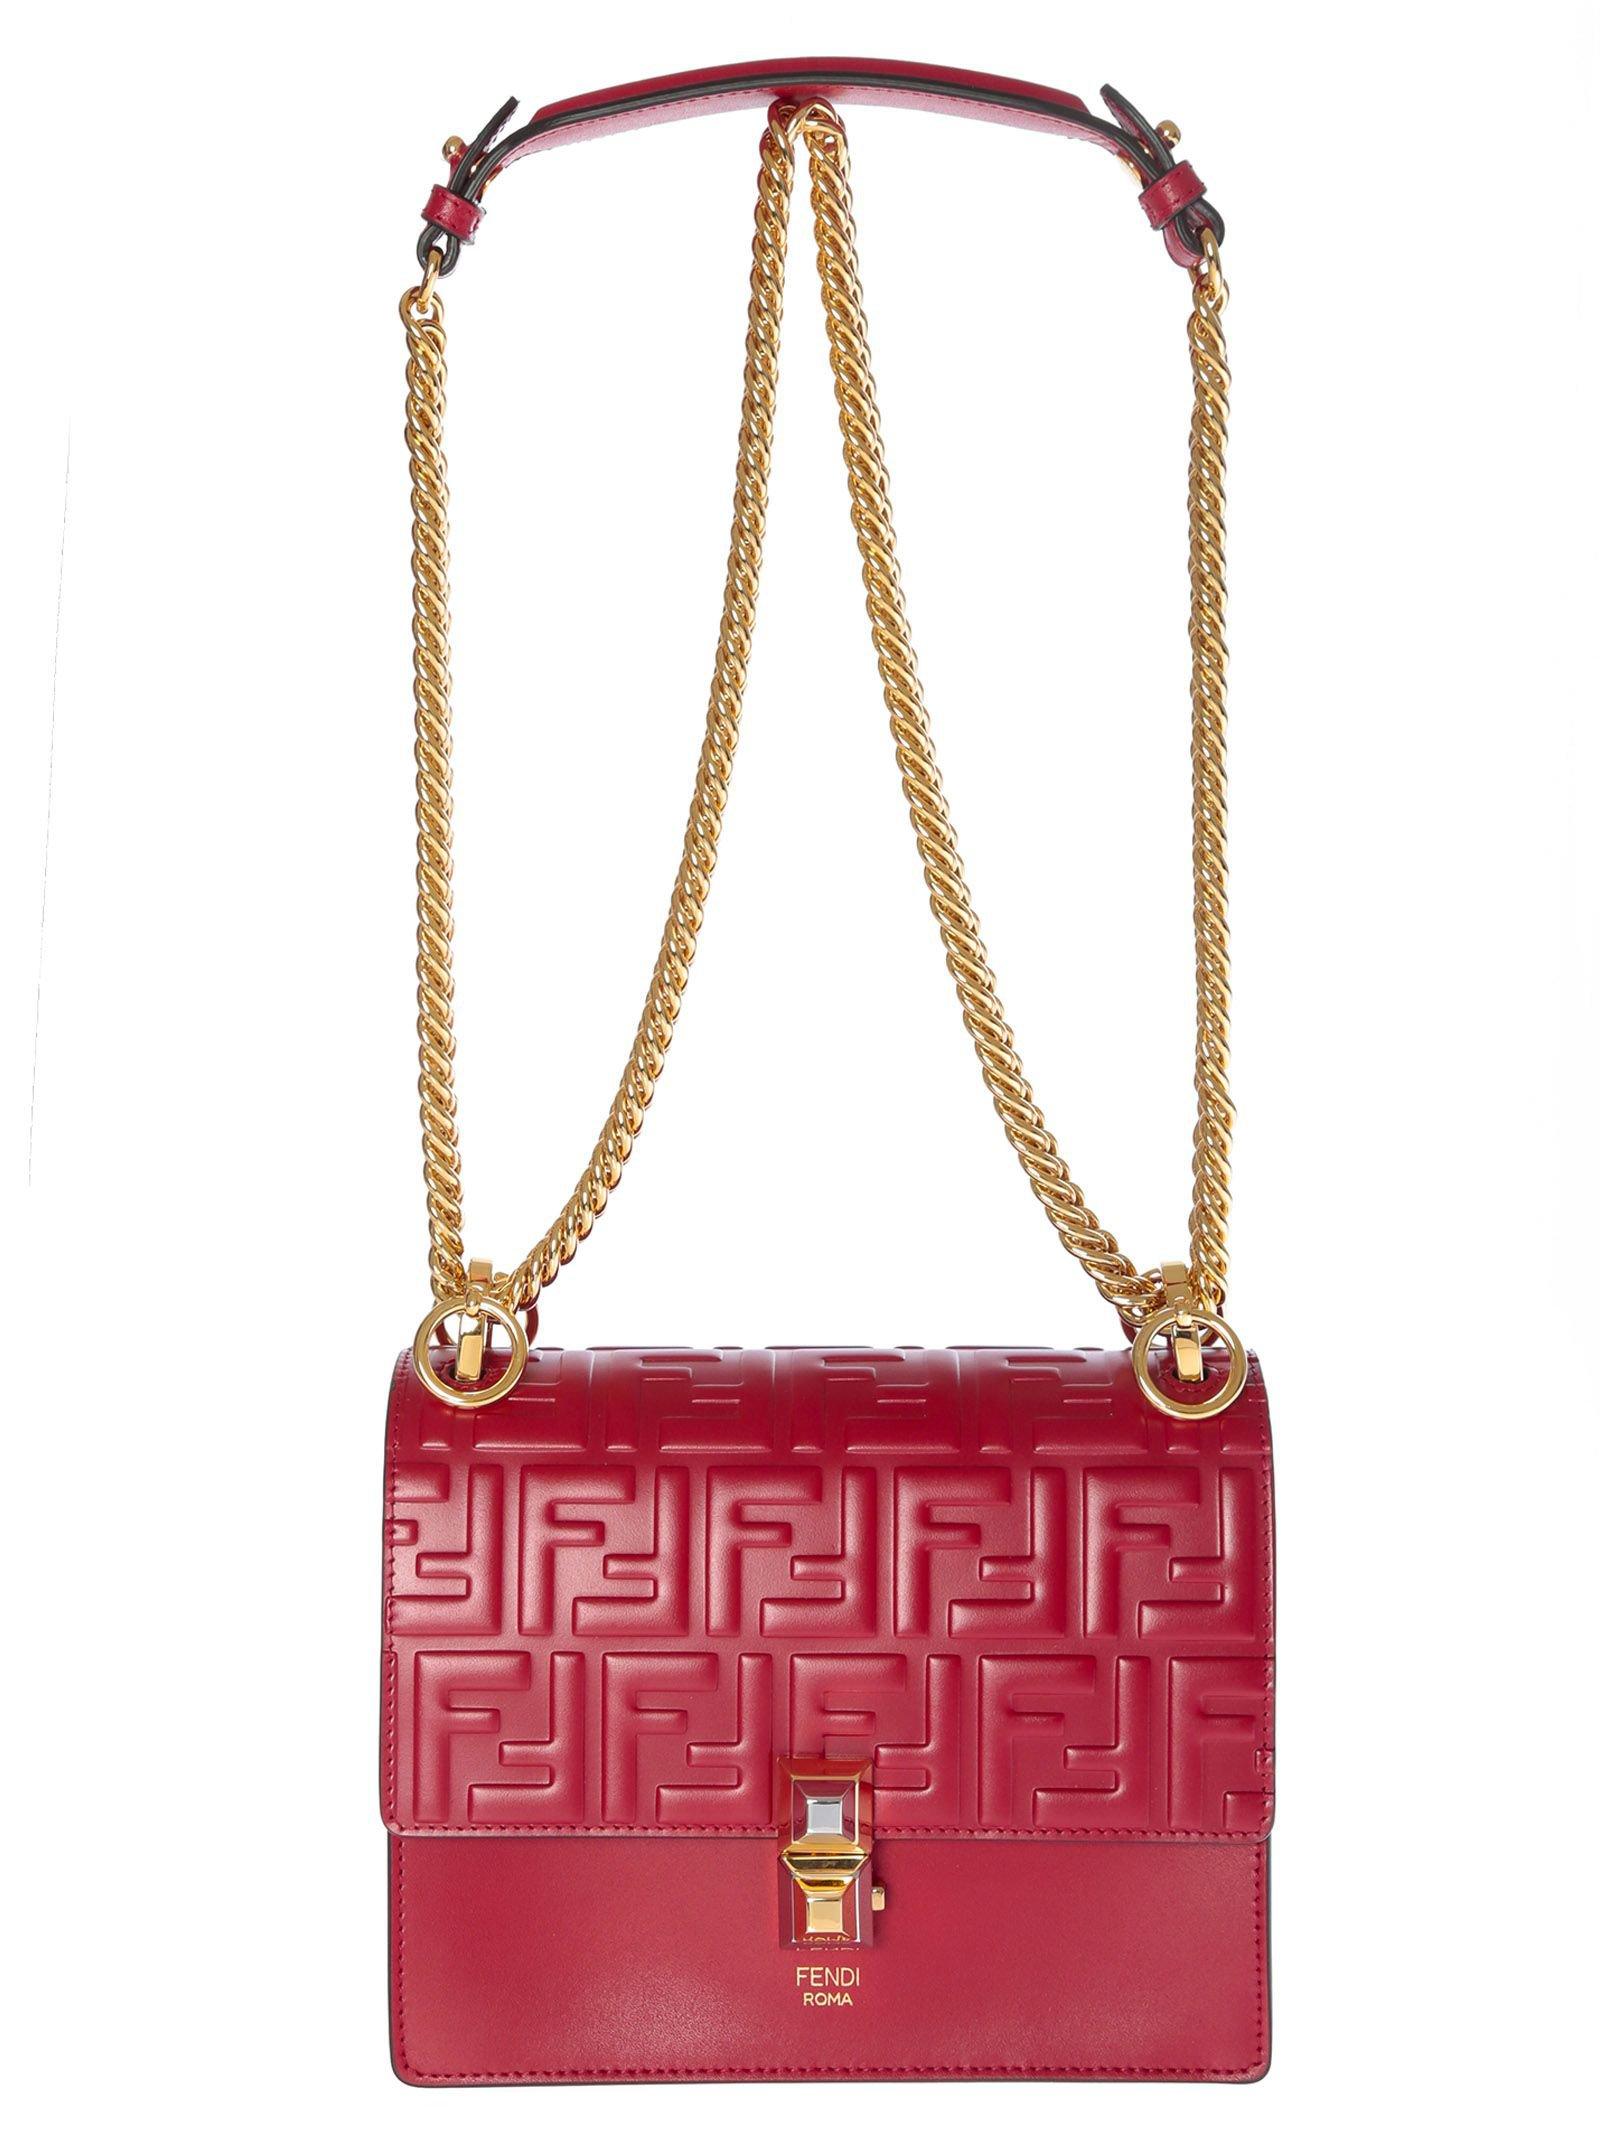 Fendi Small Kan Shoulder Bag